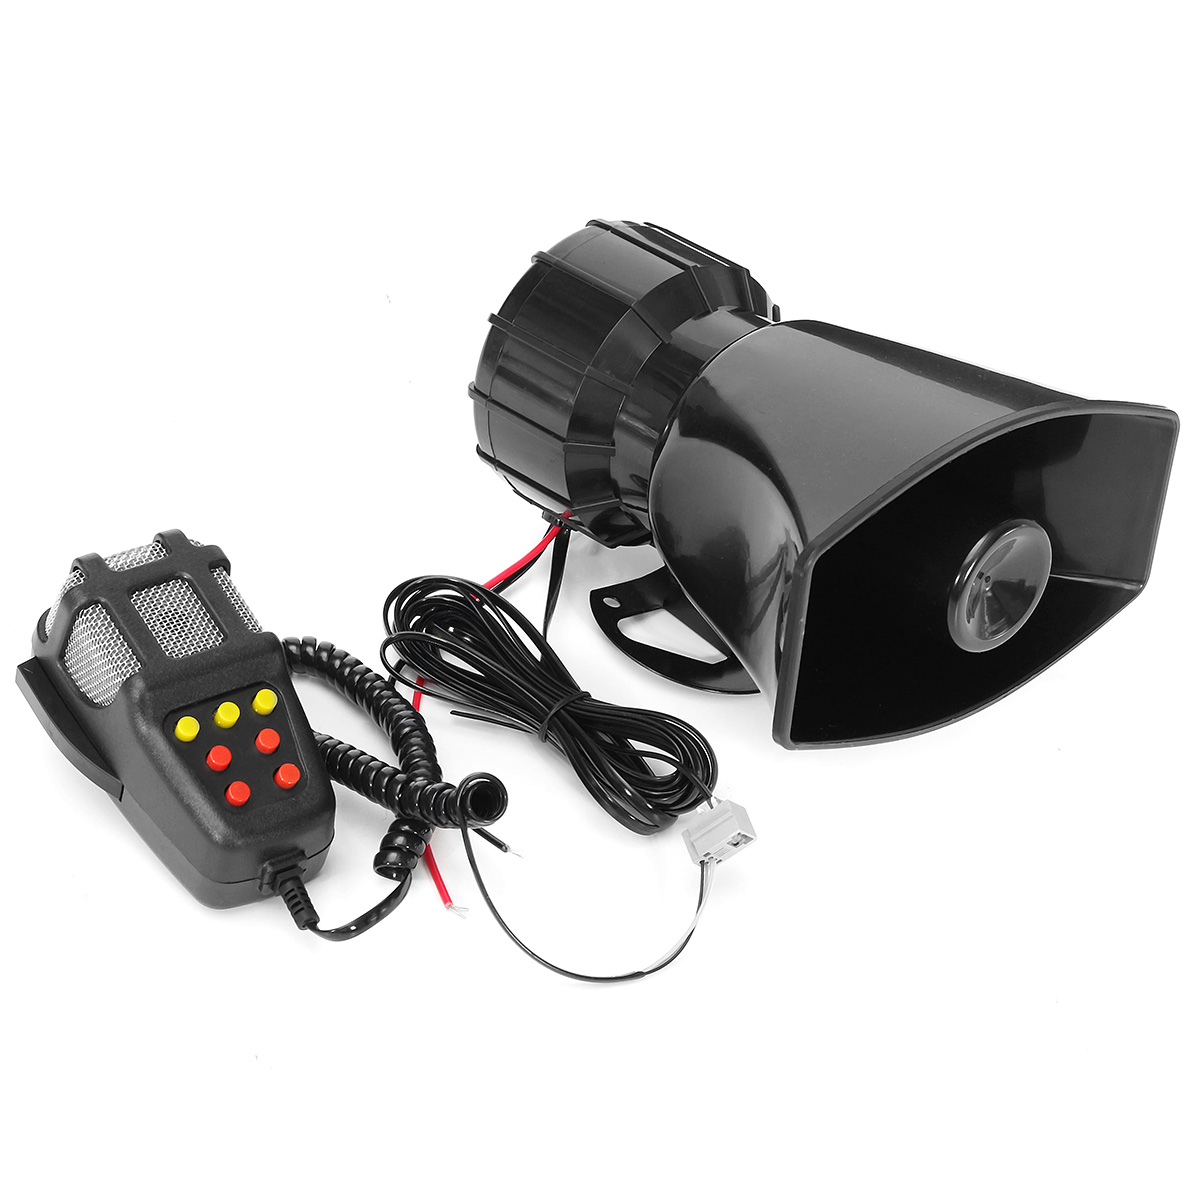 ECCPP 12V 7 Tones Tones Sound Warning Alarm Horn Electric Horn for Fire Alarm Traffic Emergency